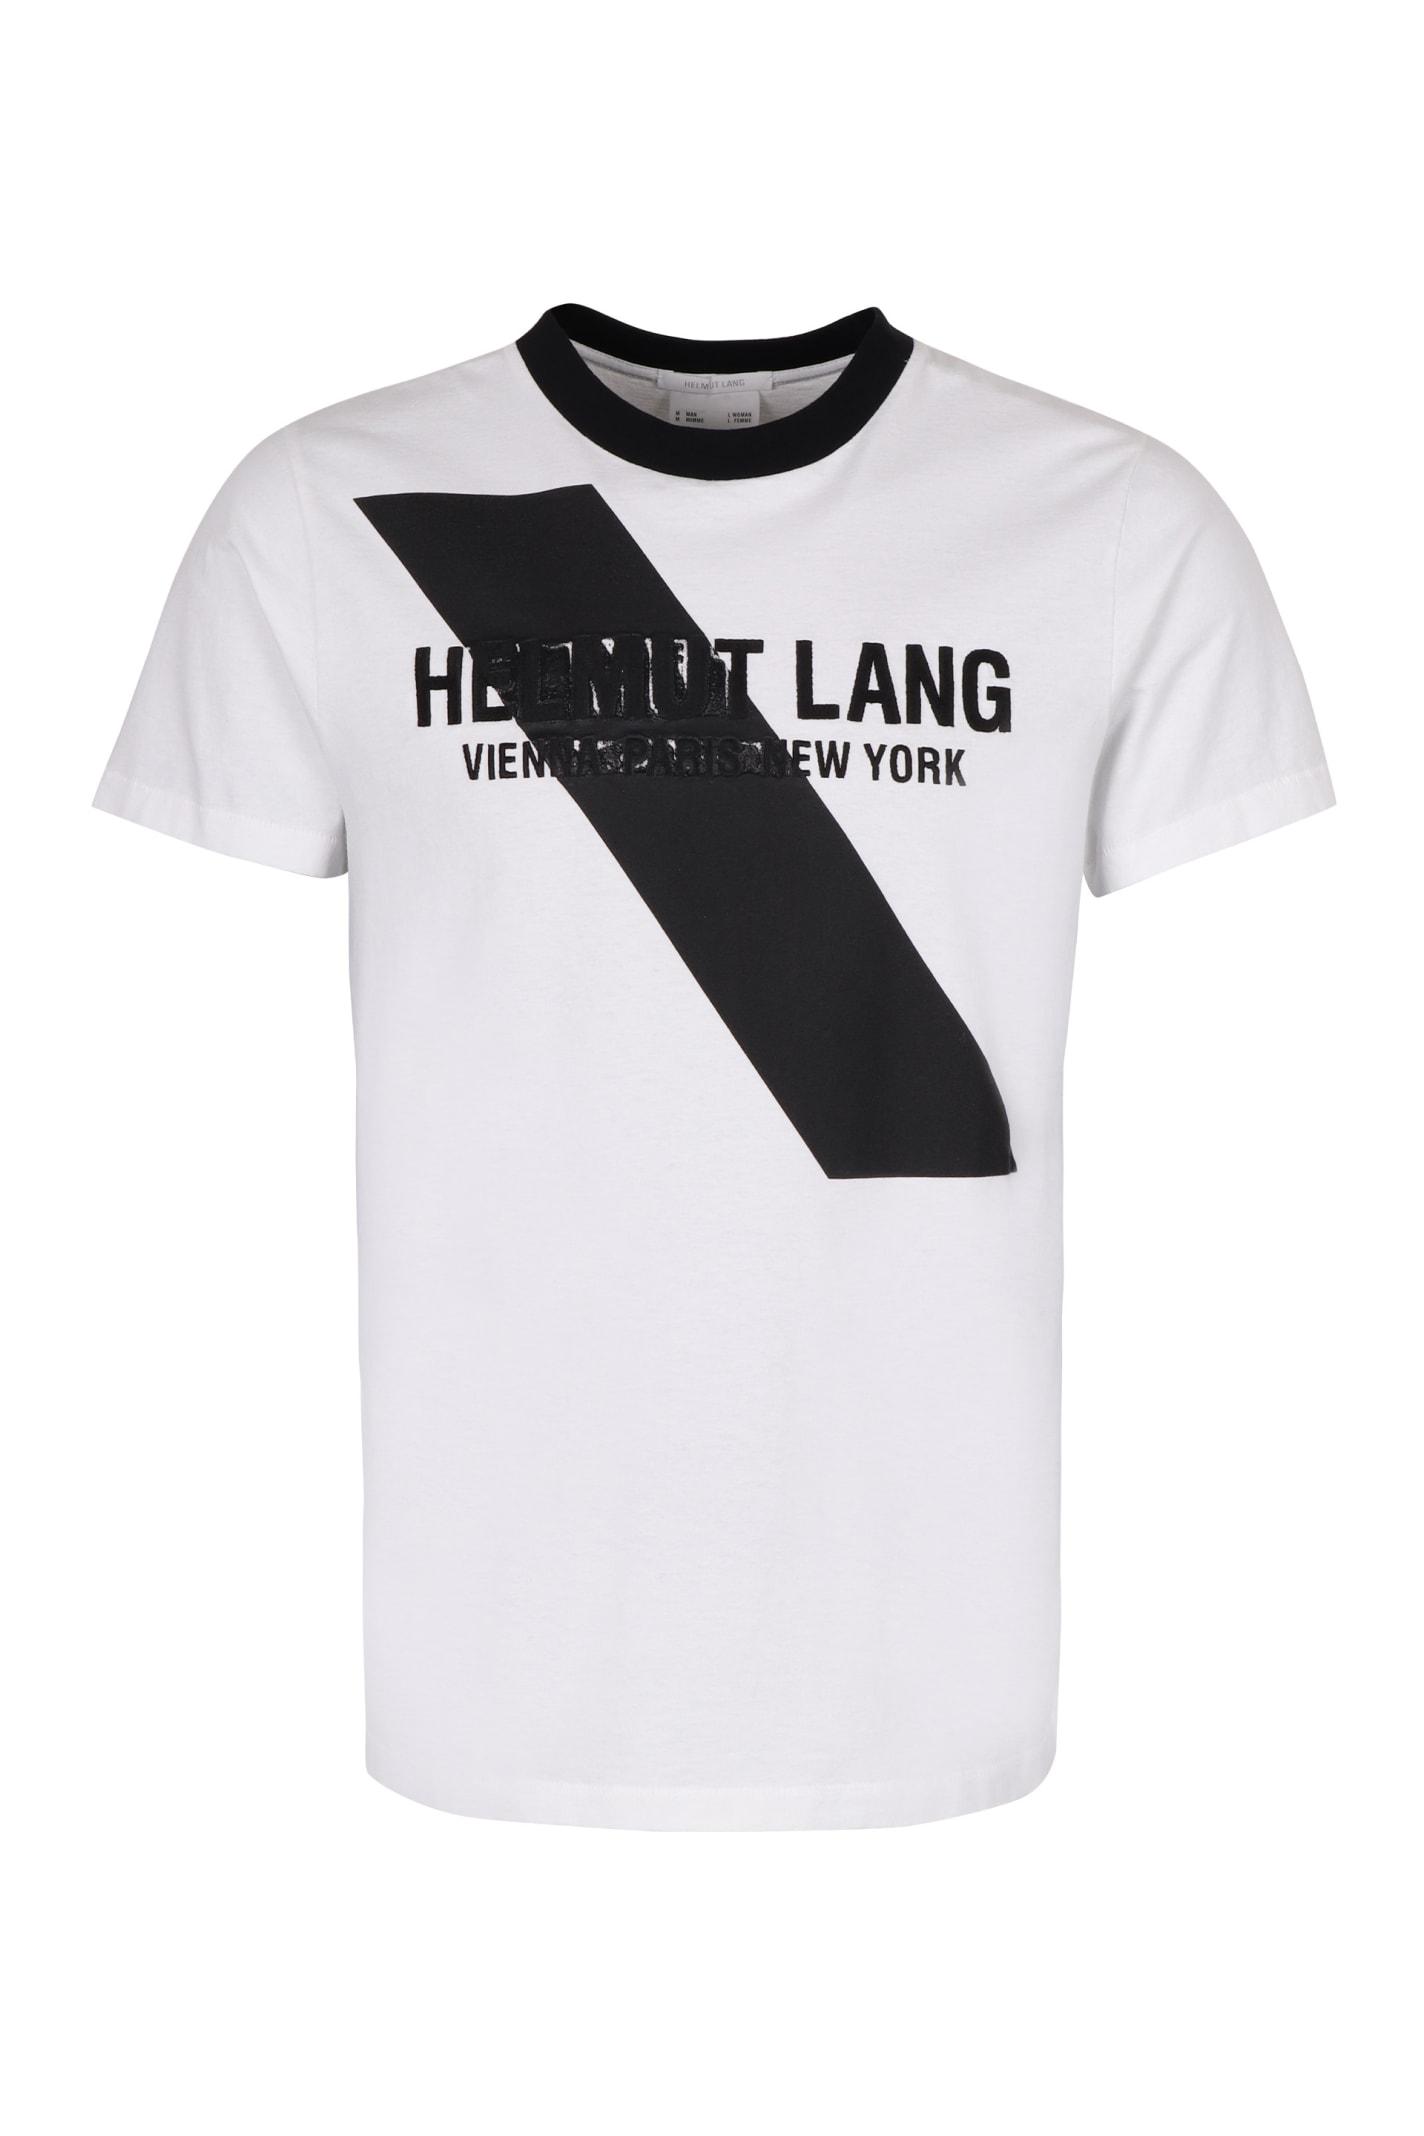 Helmut Lang Logo Print Cotton T-shirt